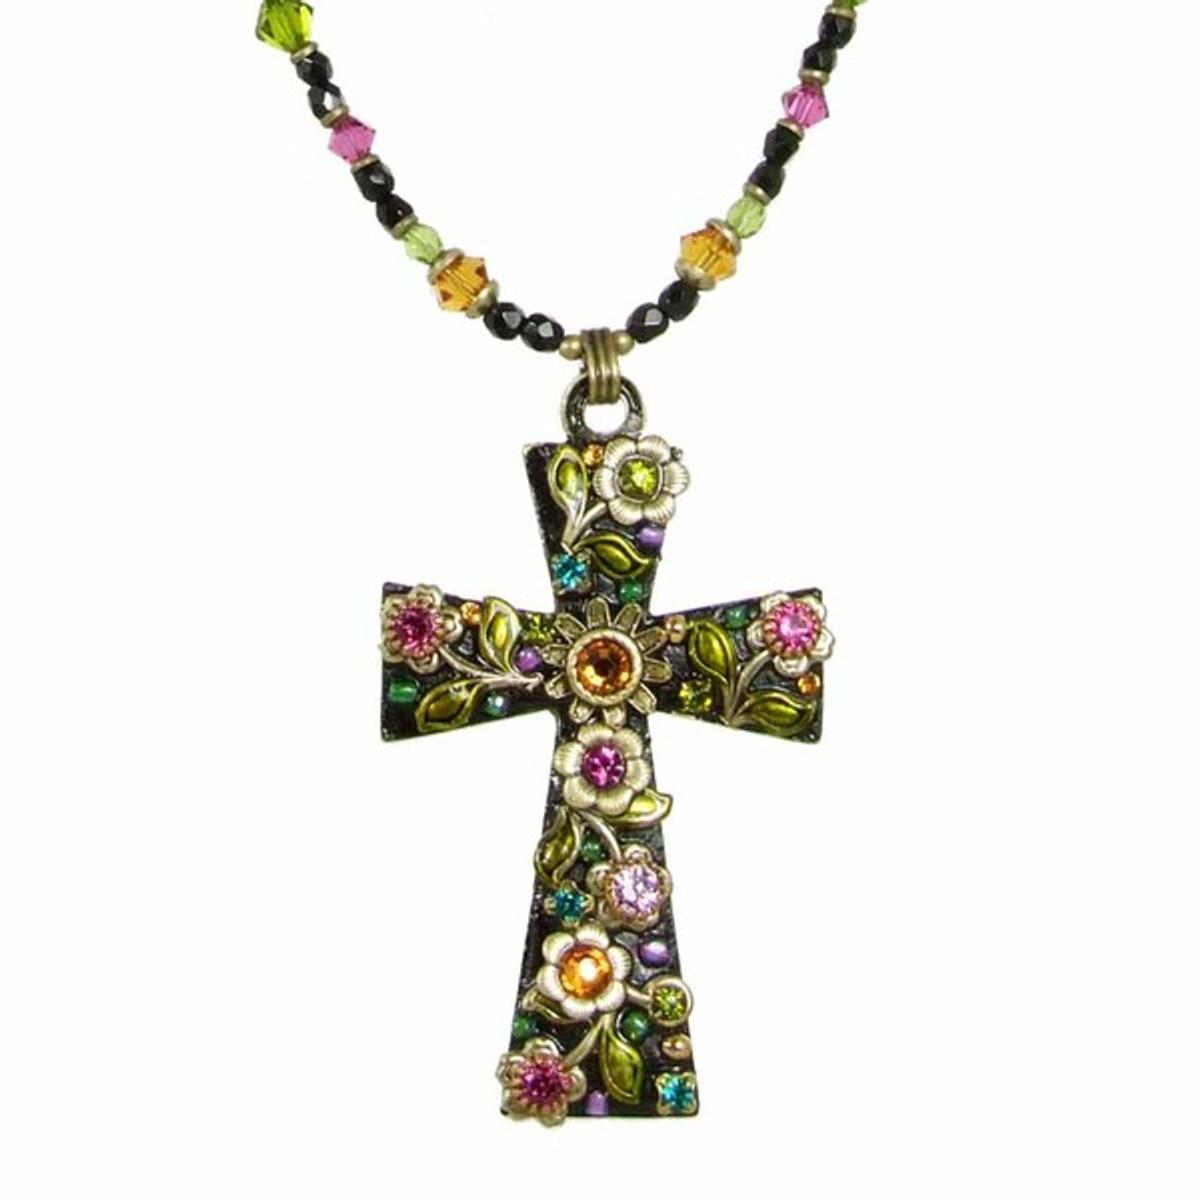 Large Dark Floral Cross Necklace